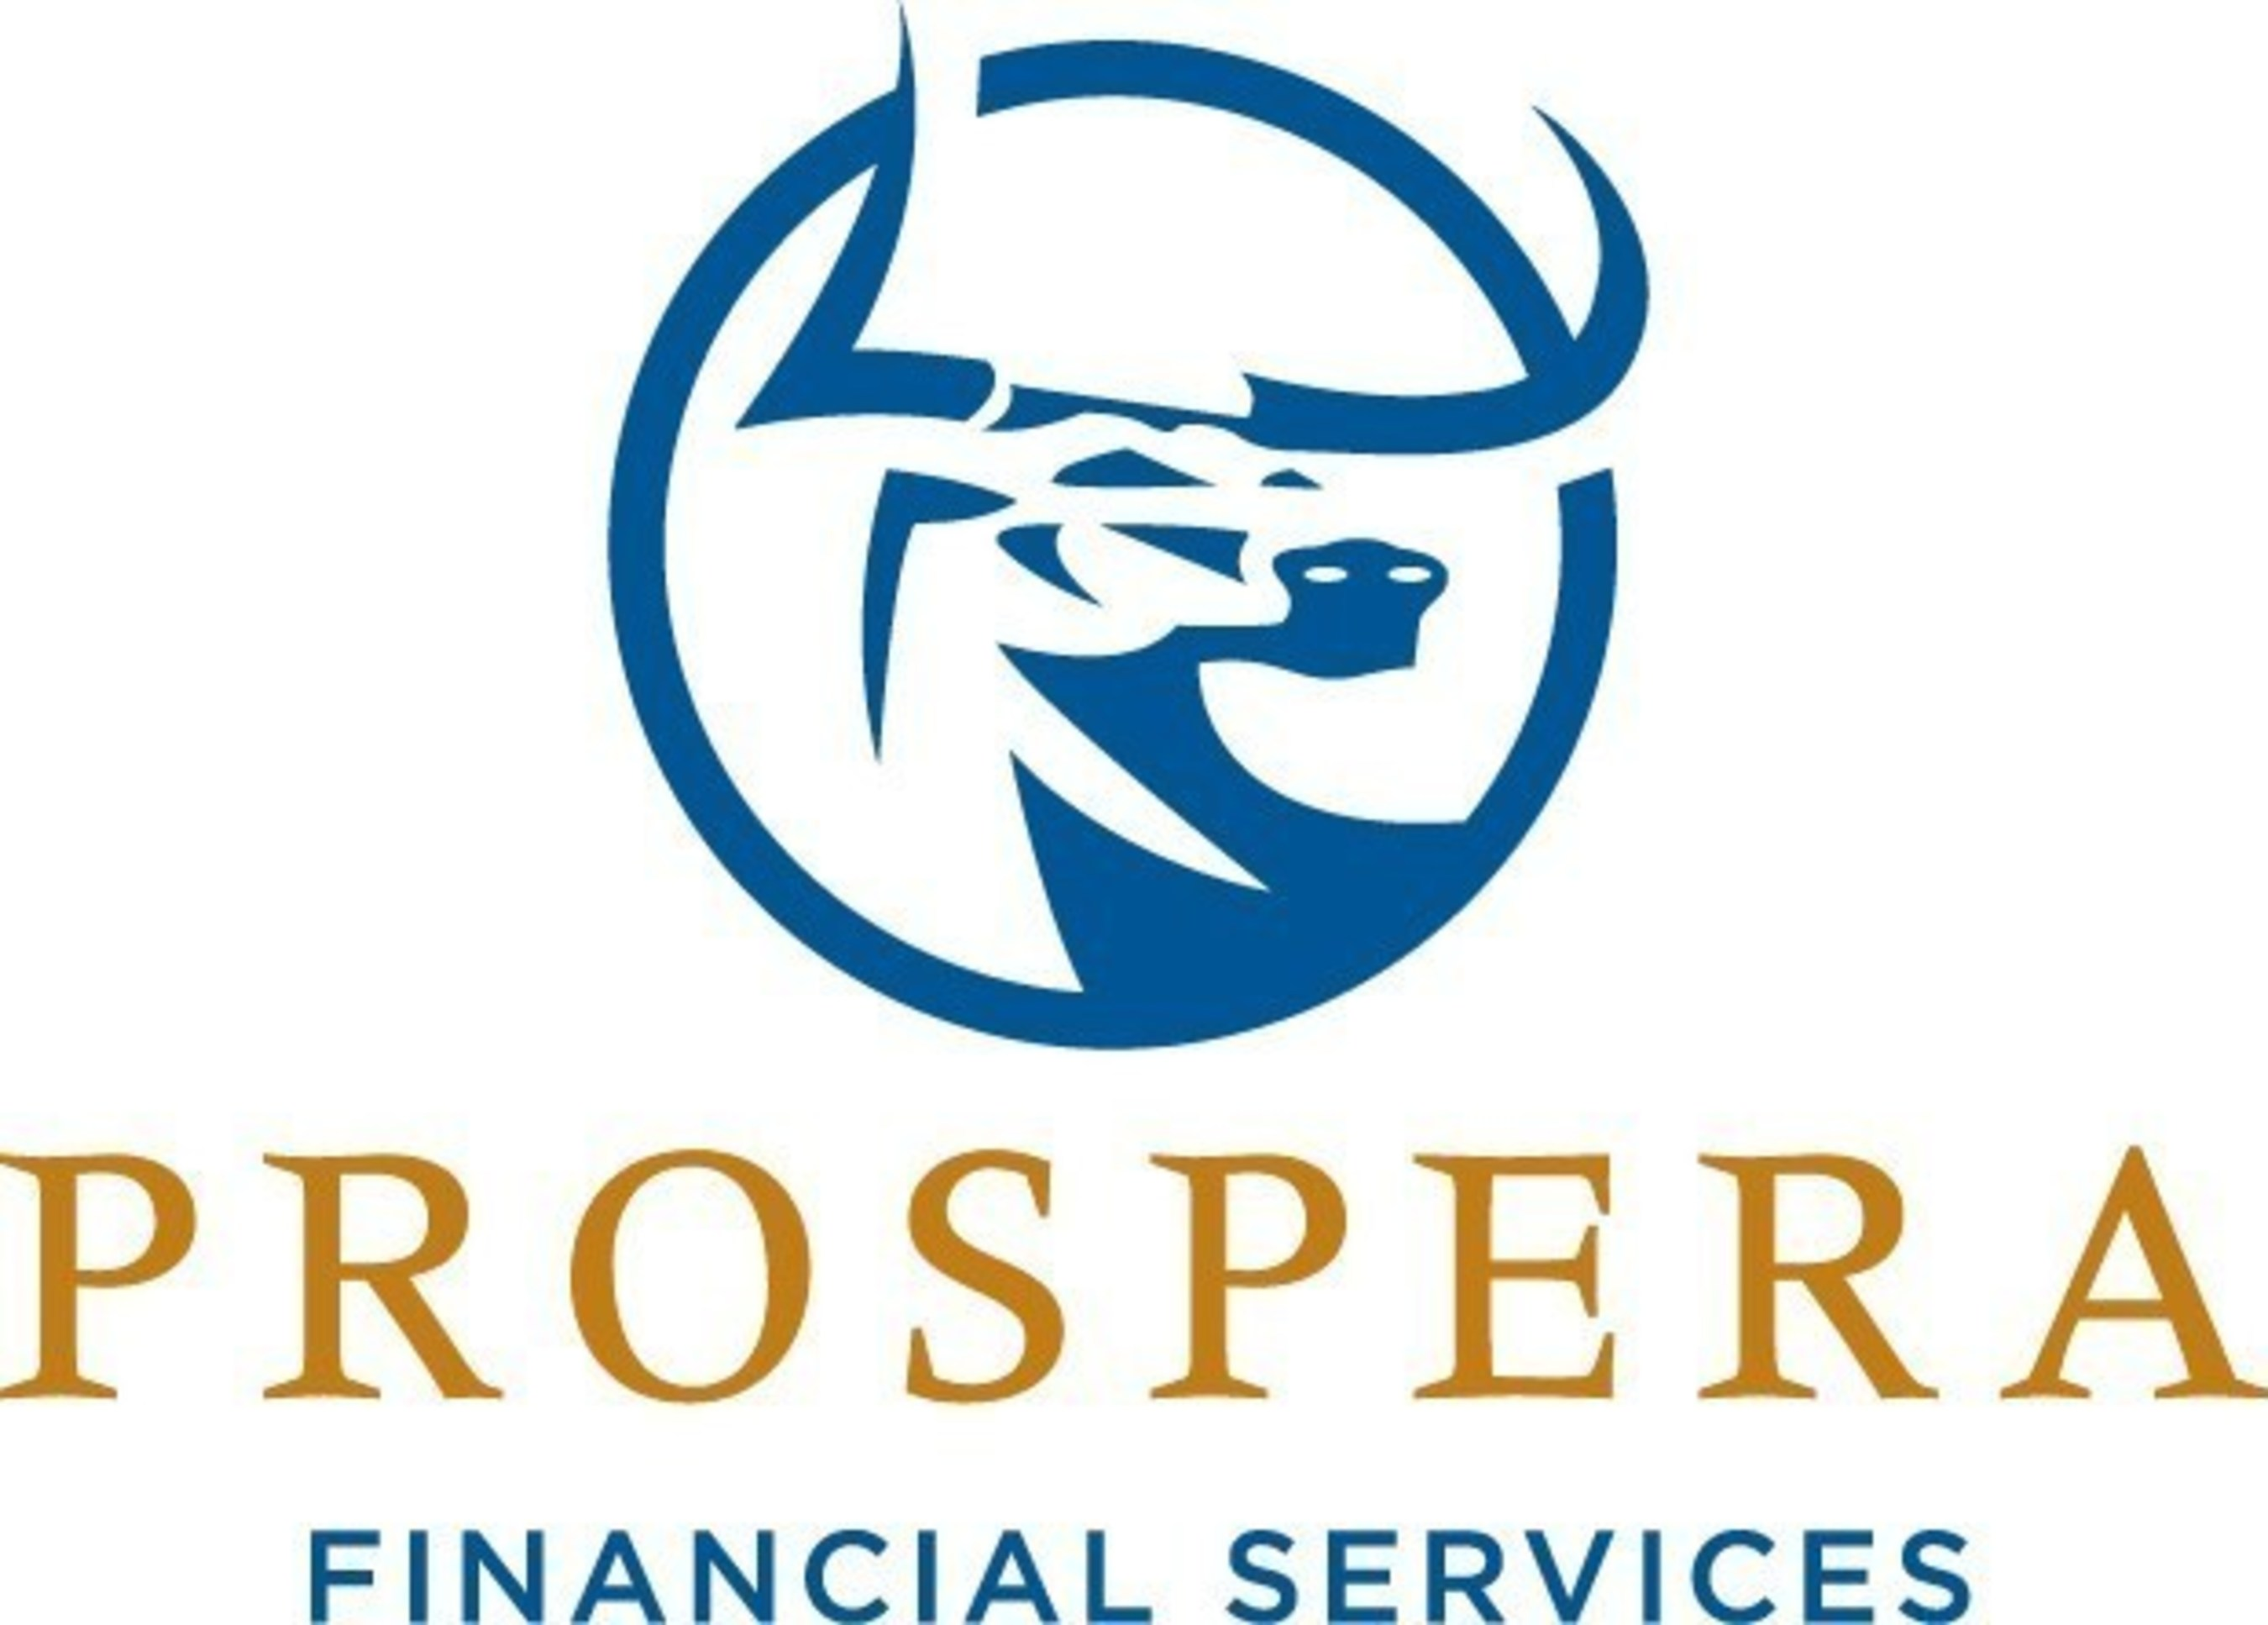 Broker dealer financial services